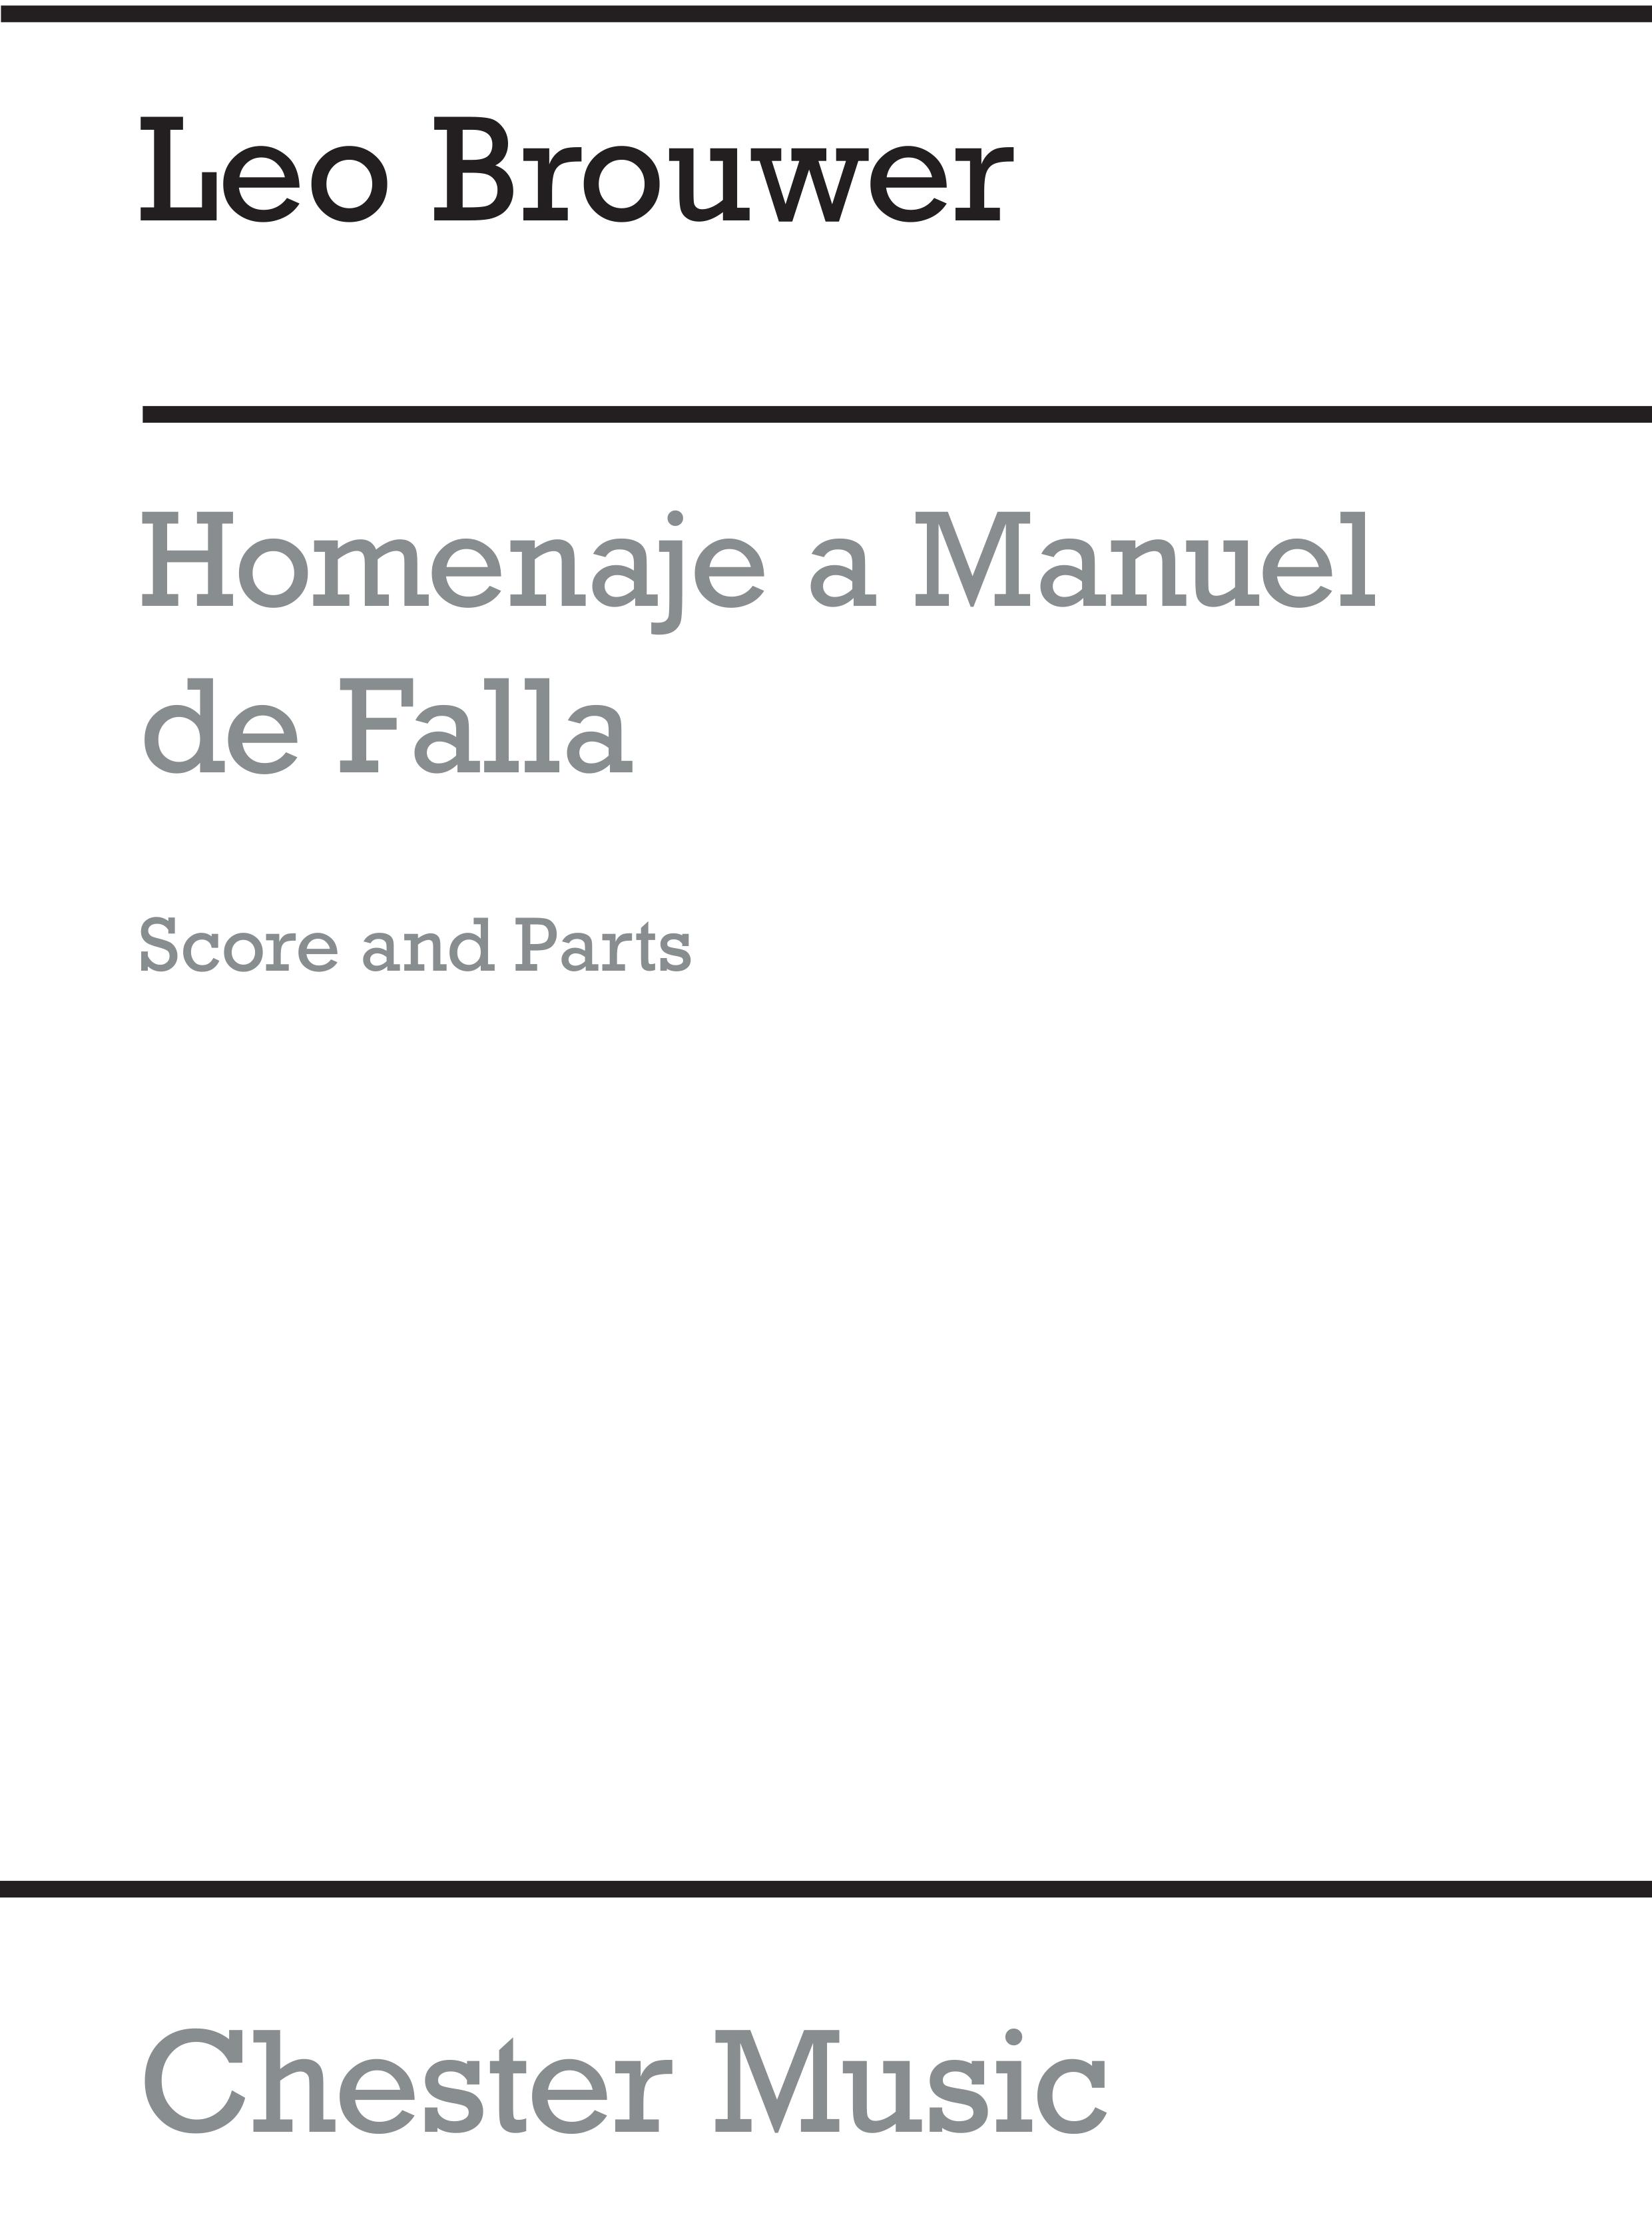 Leo Brouwer: Homenaje A Manuel De Falla: Chamber Ensemble: Score and Parts